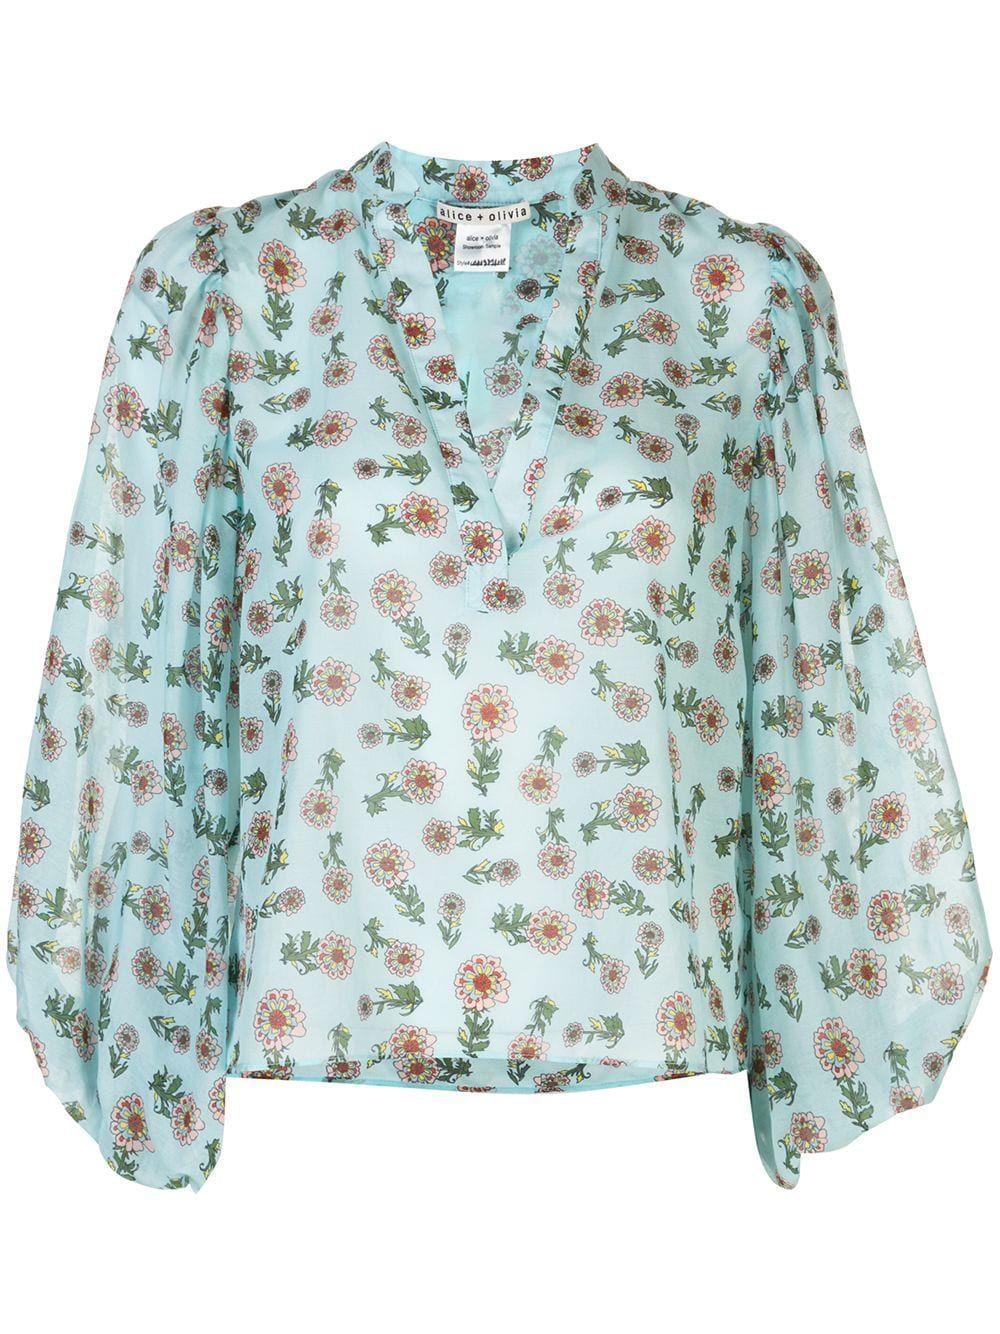 Casey Mandarin Collar Blouse Item # CC003P26049-C